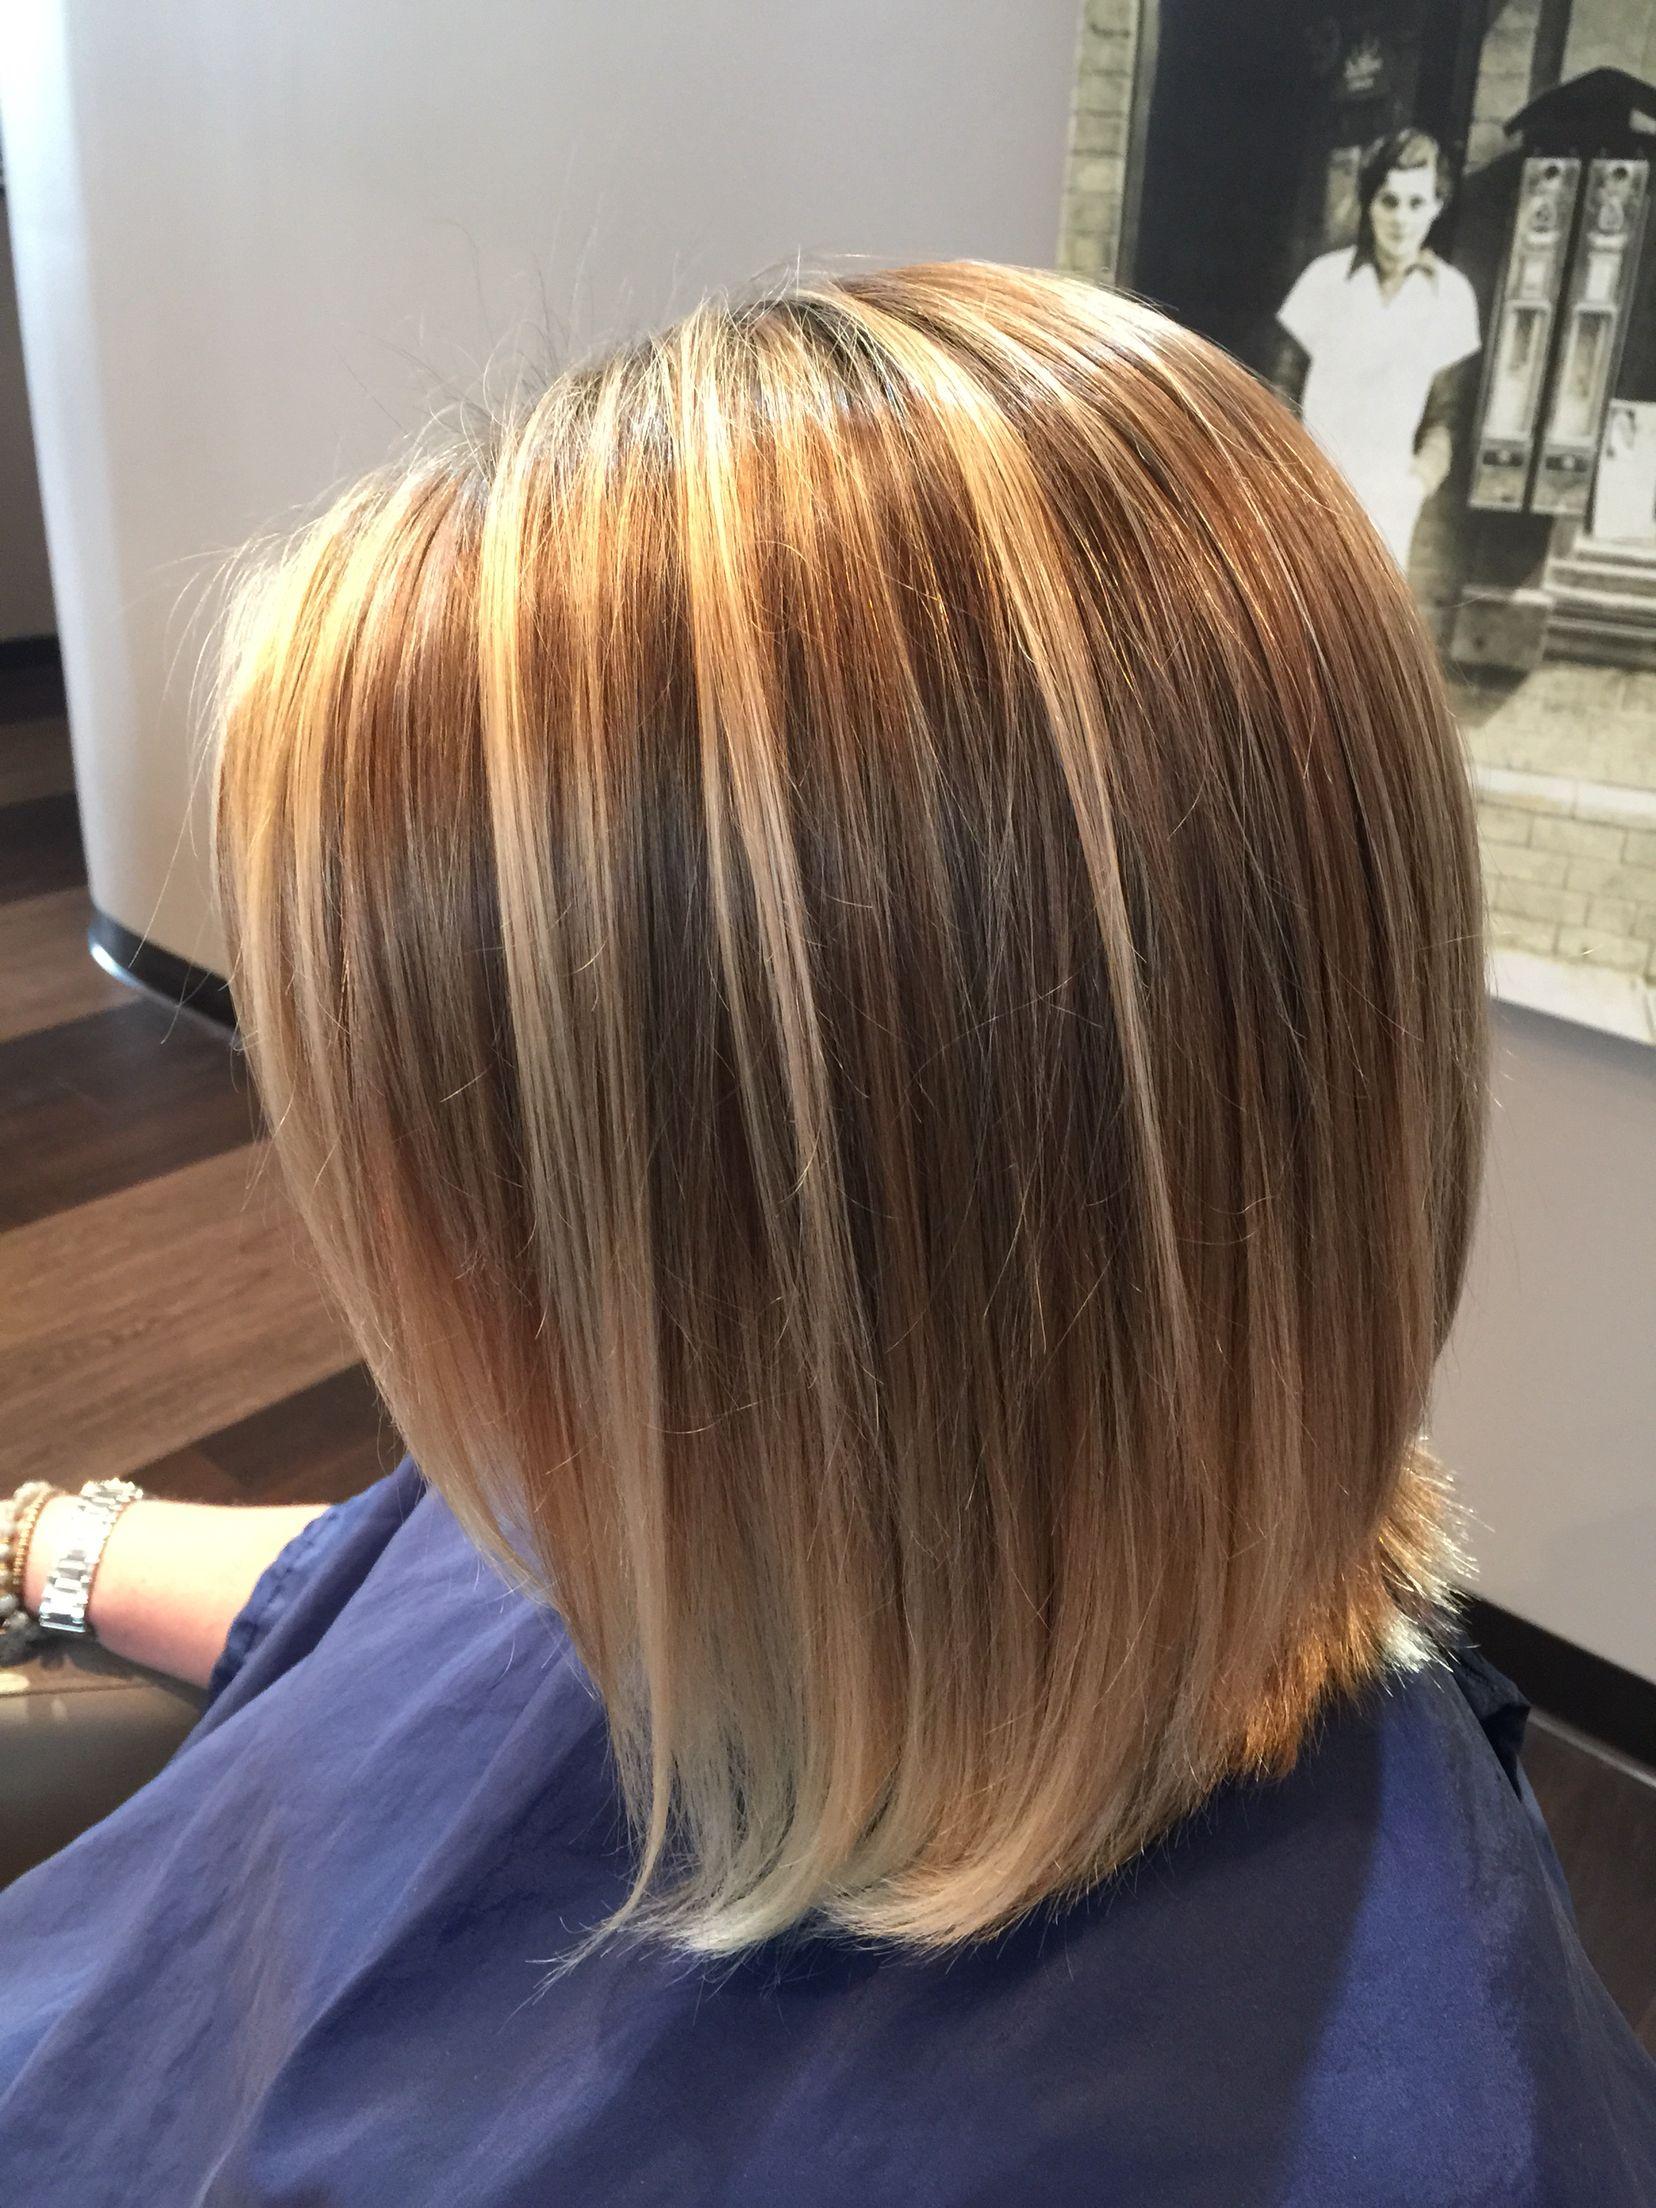 New Balayage On Bob Hair Styles Hair Cool Hairstyles